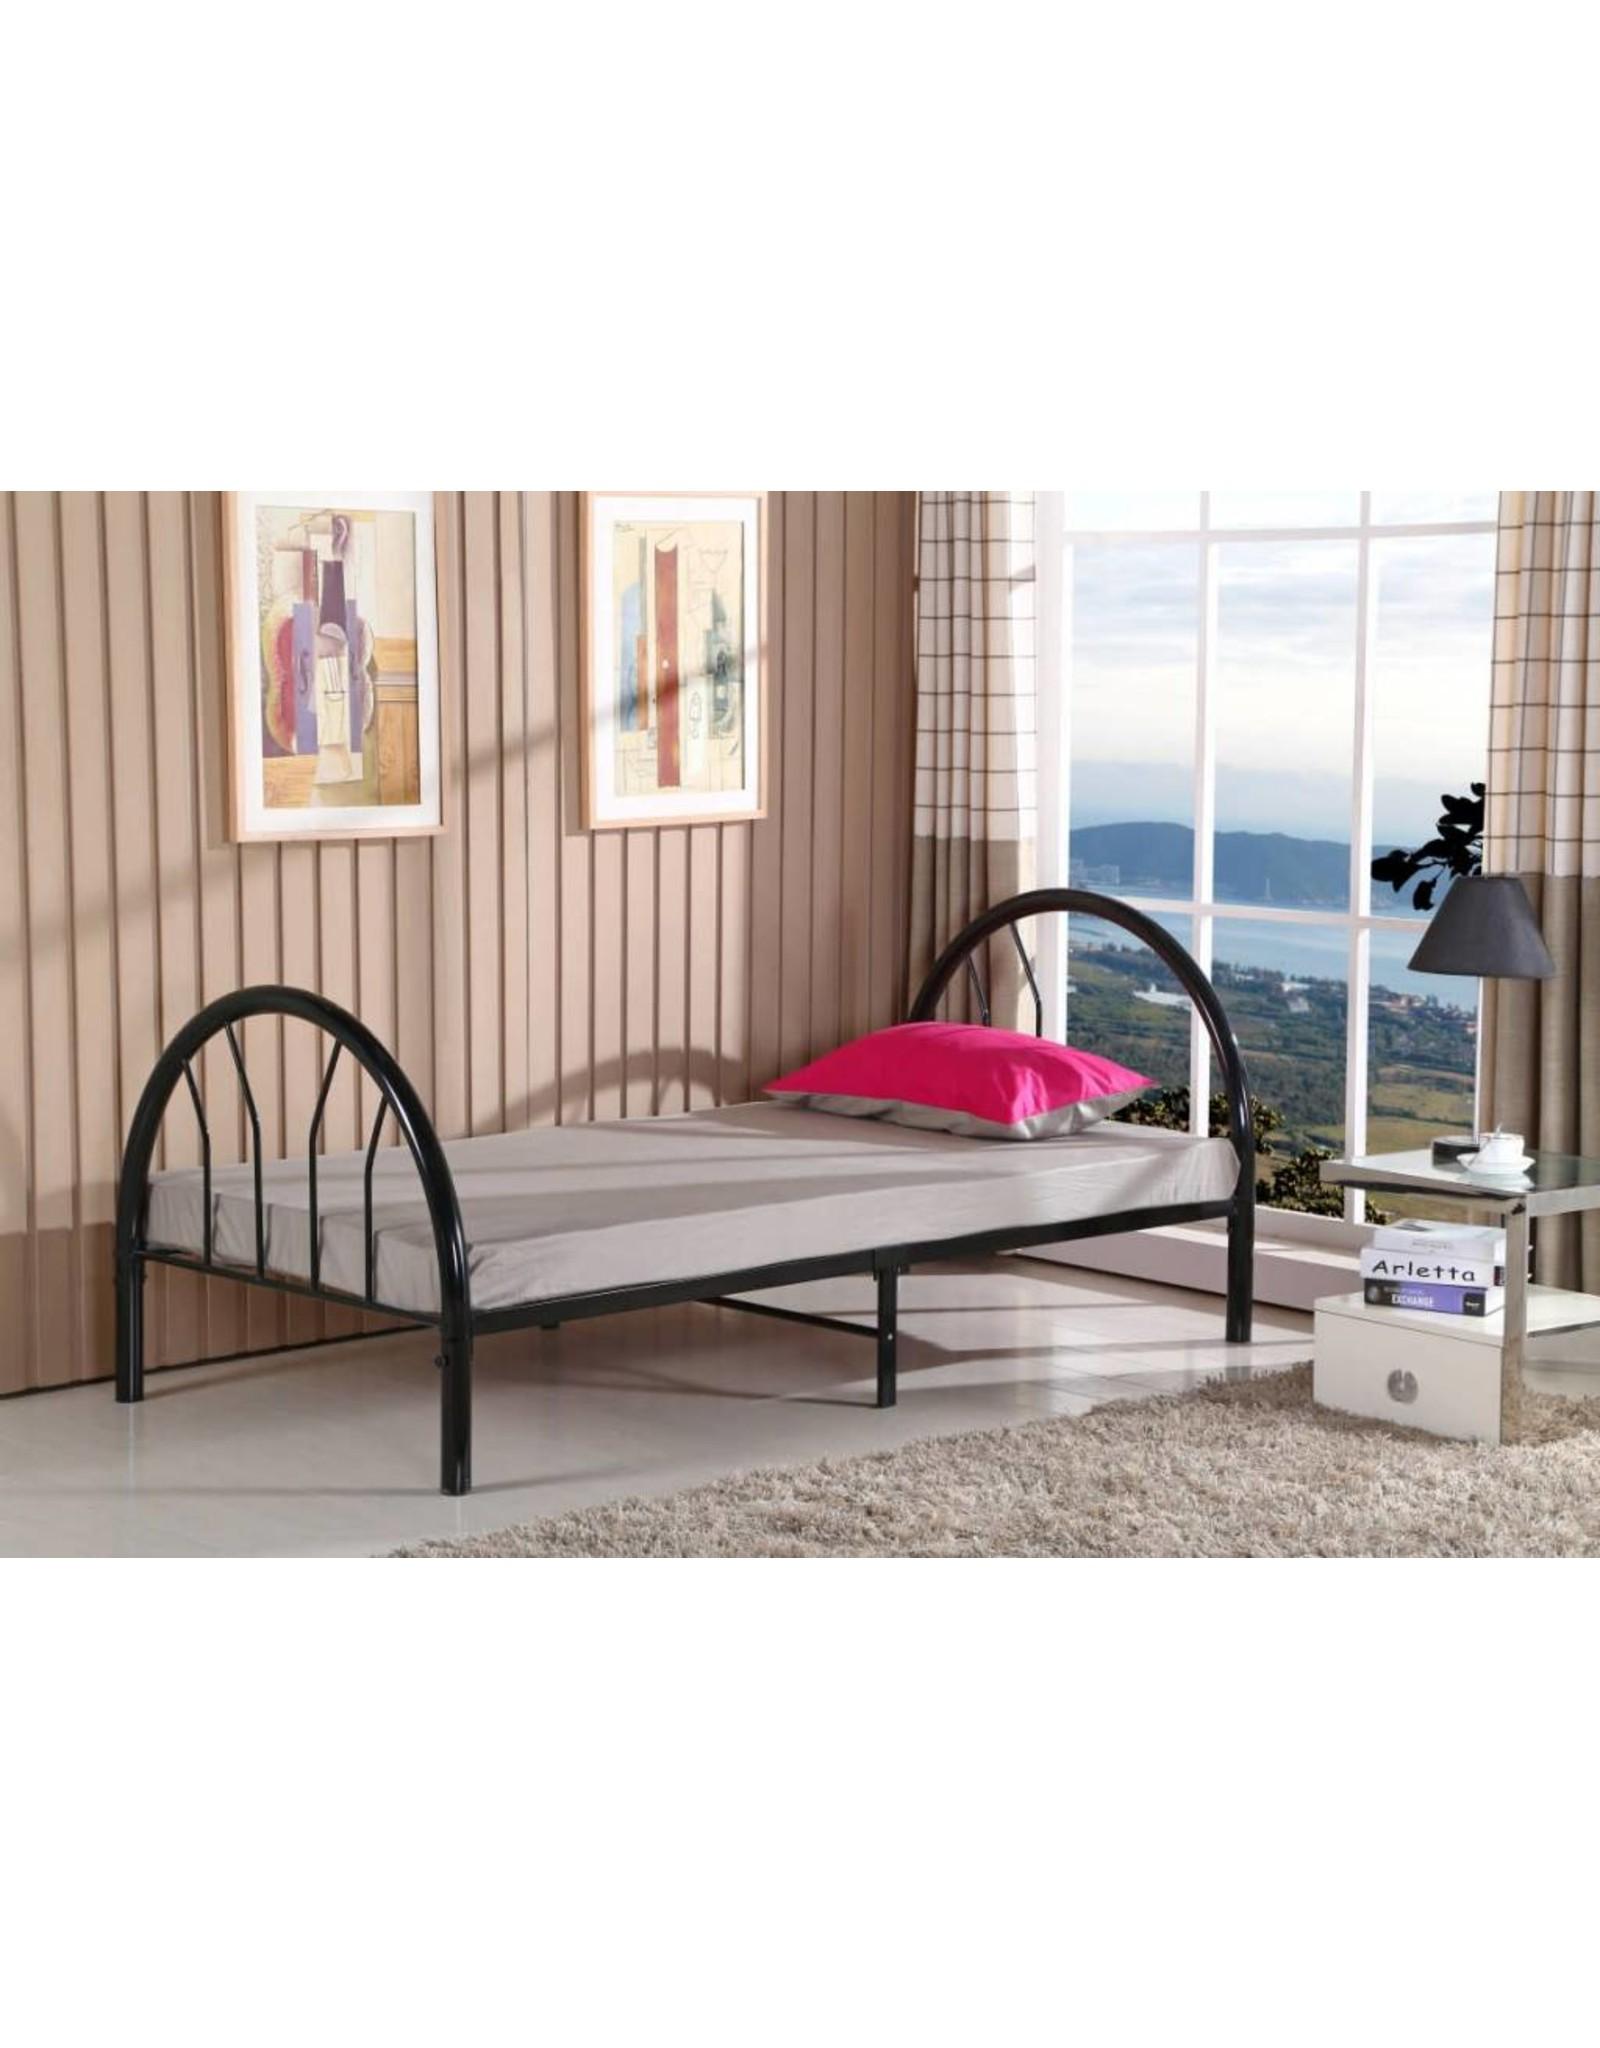 GR-215 Black Twin Bed